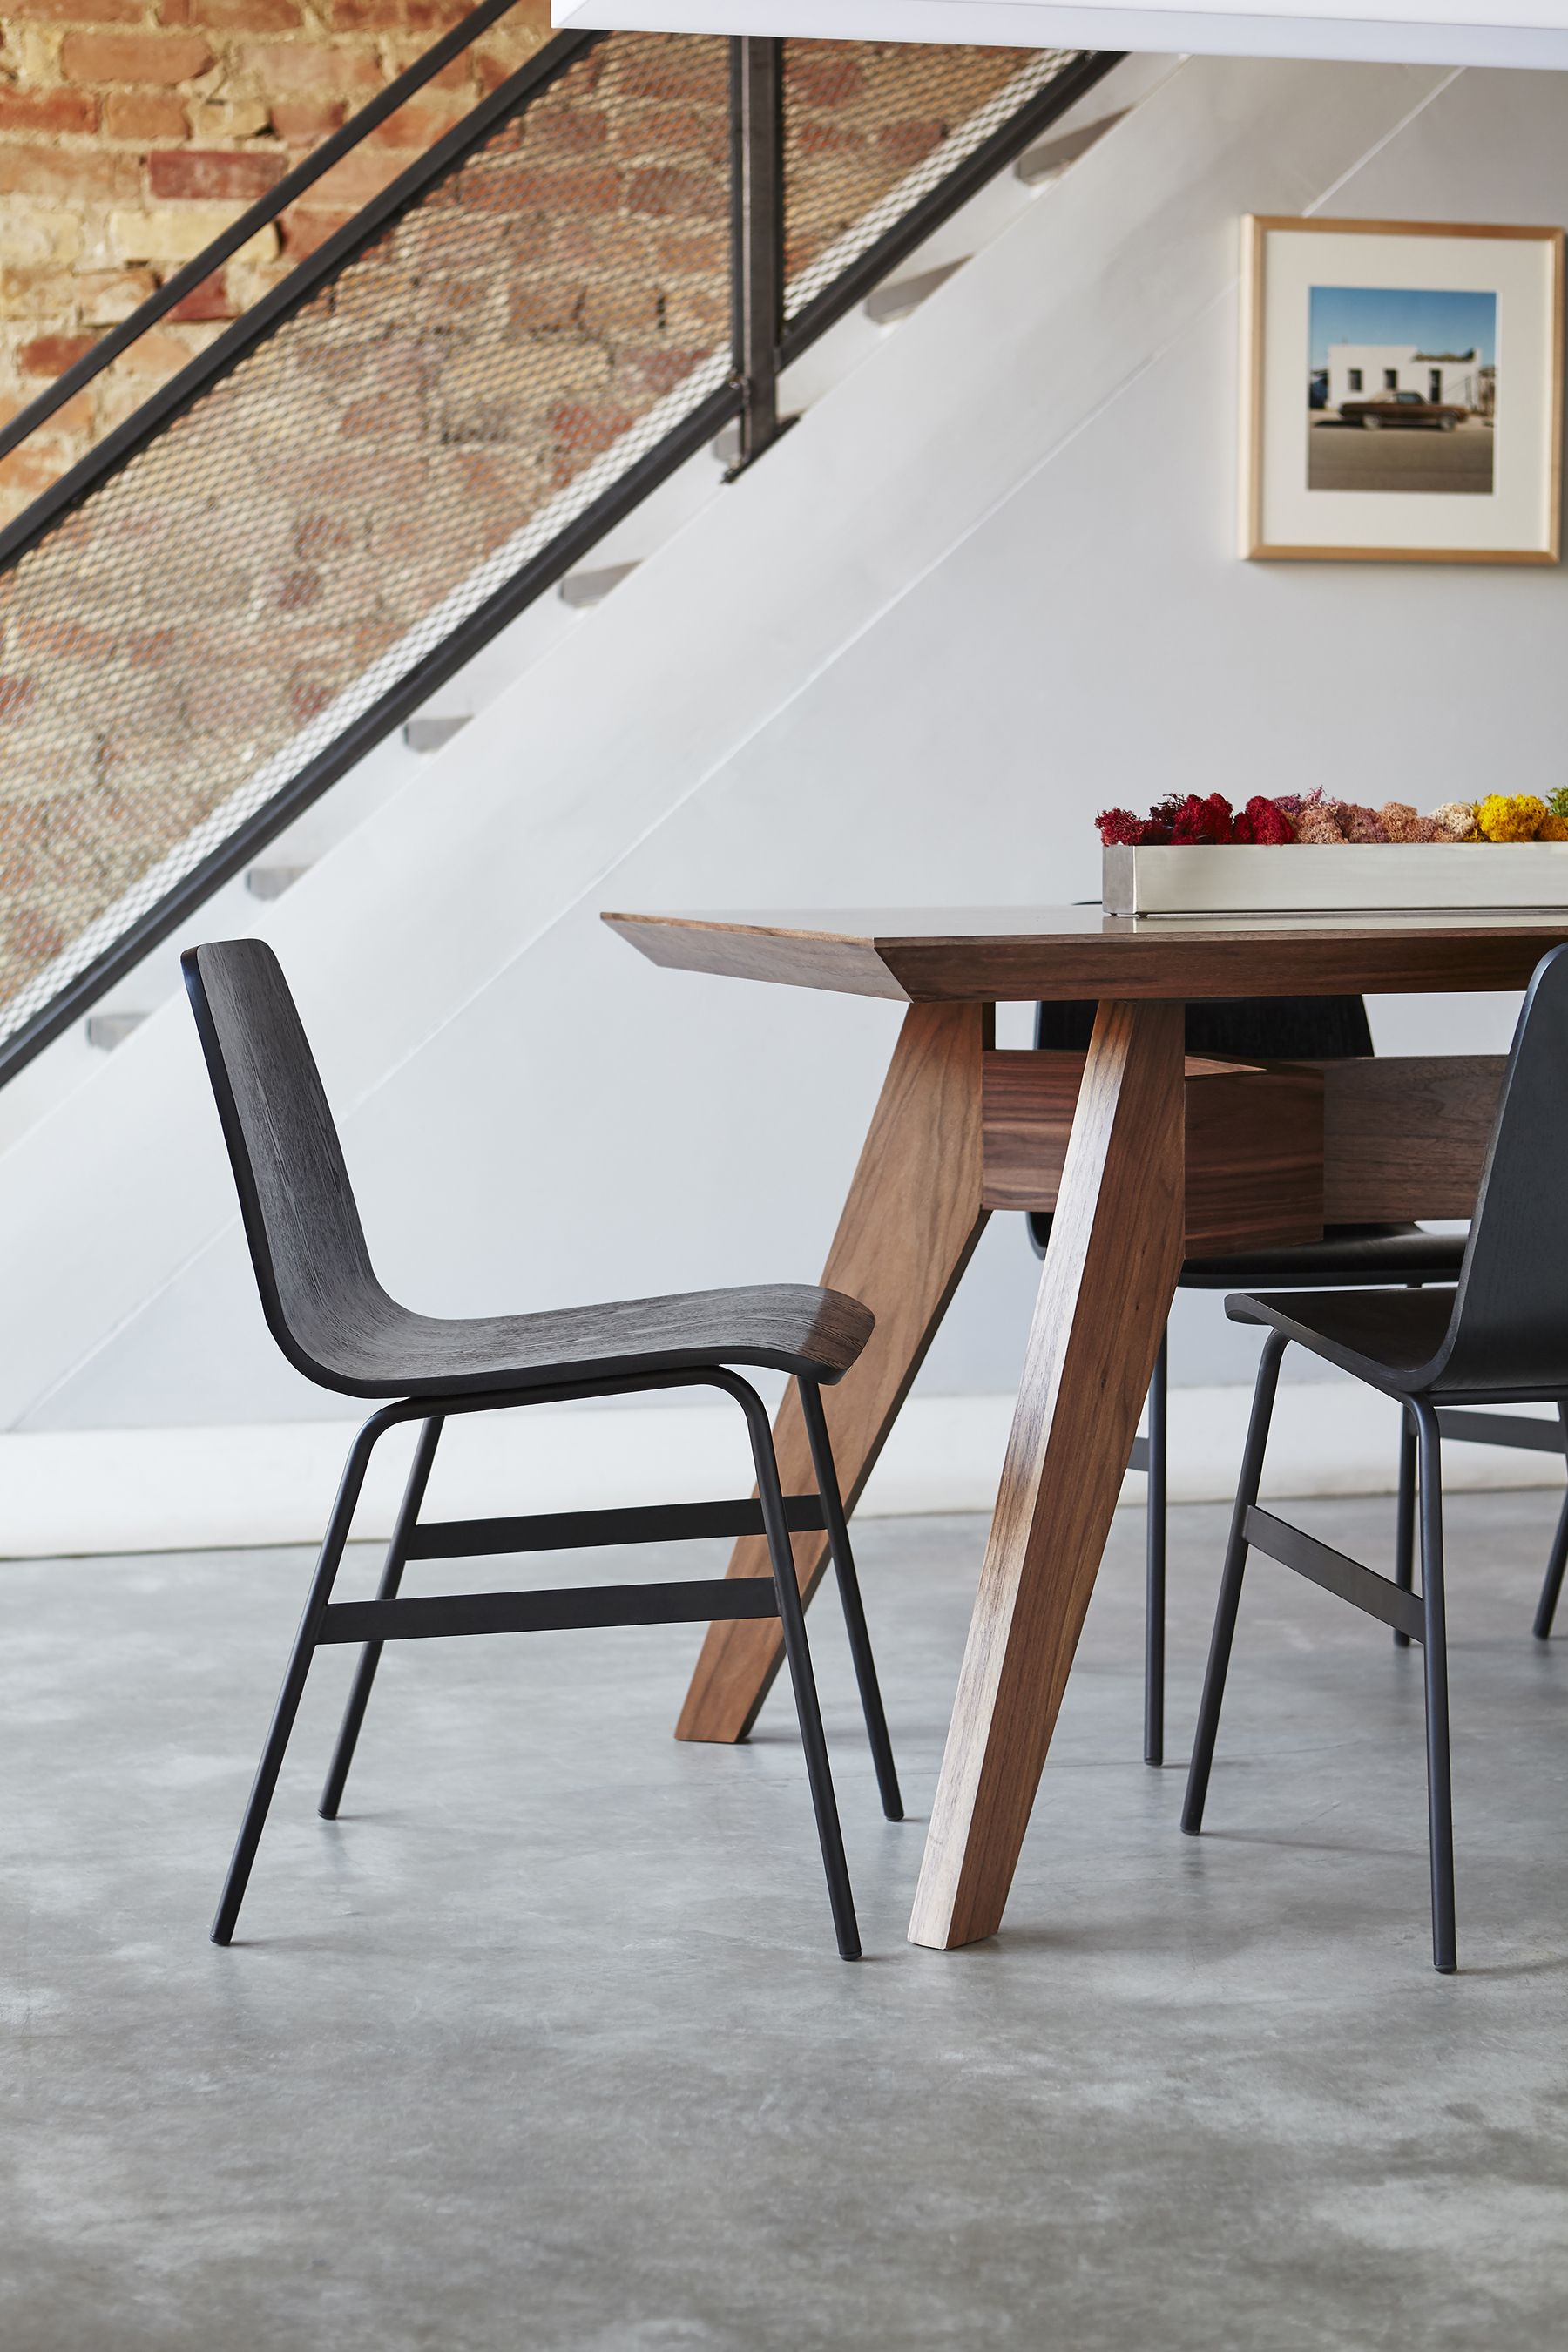 The lecture chair is a modern reinterpretation of a classic elementary school chair design gus modern